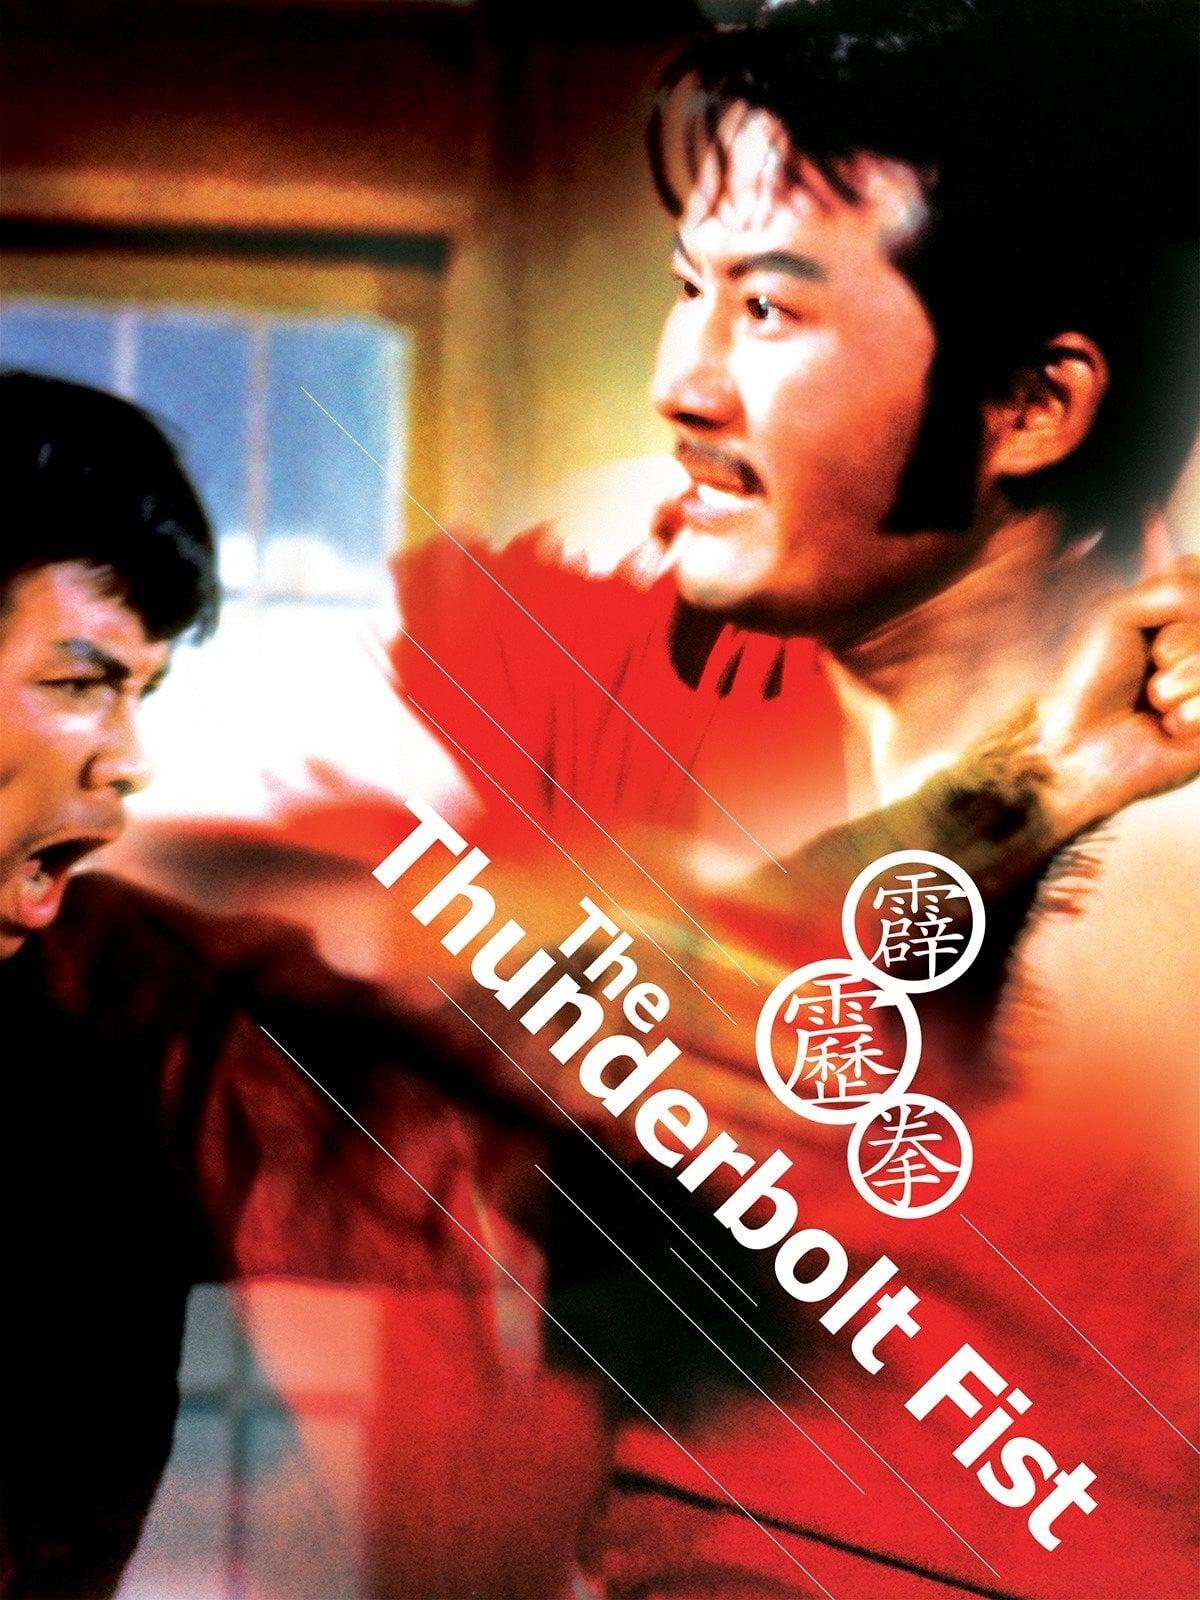 The Thunderbolt Fist